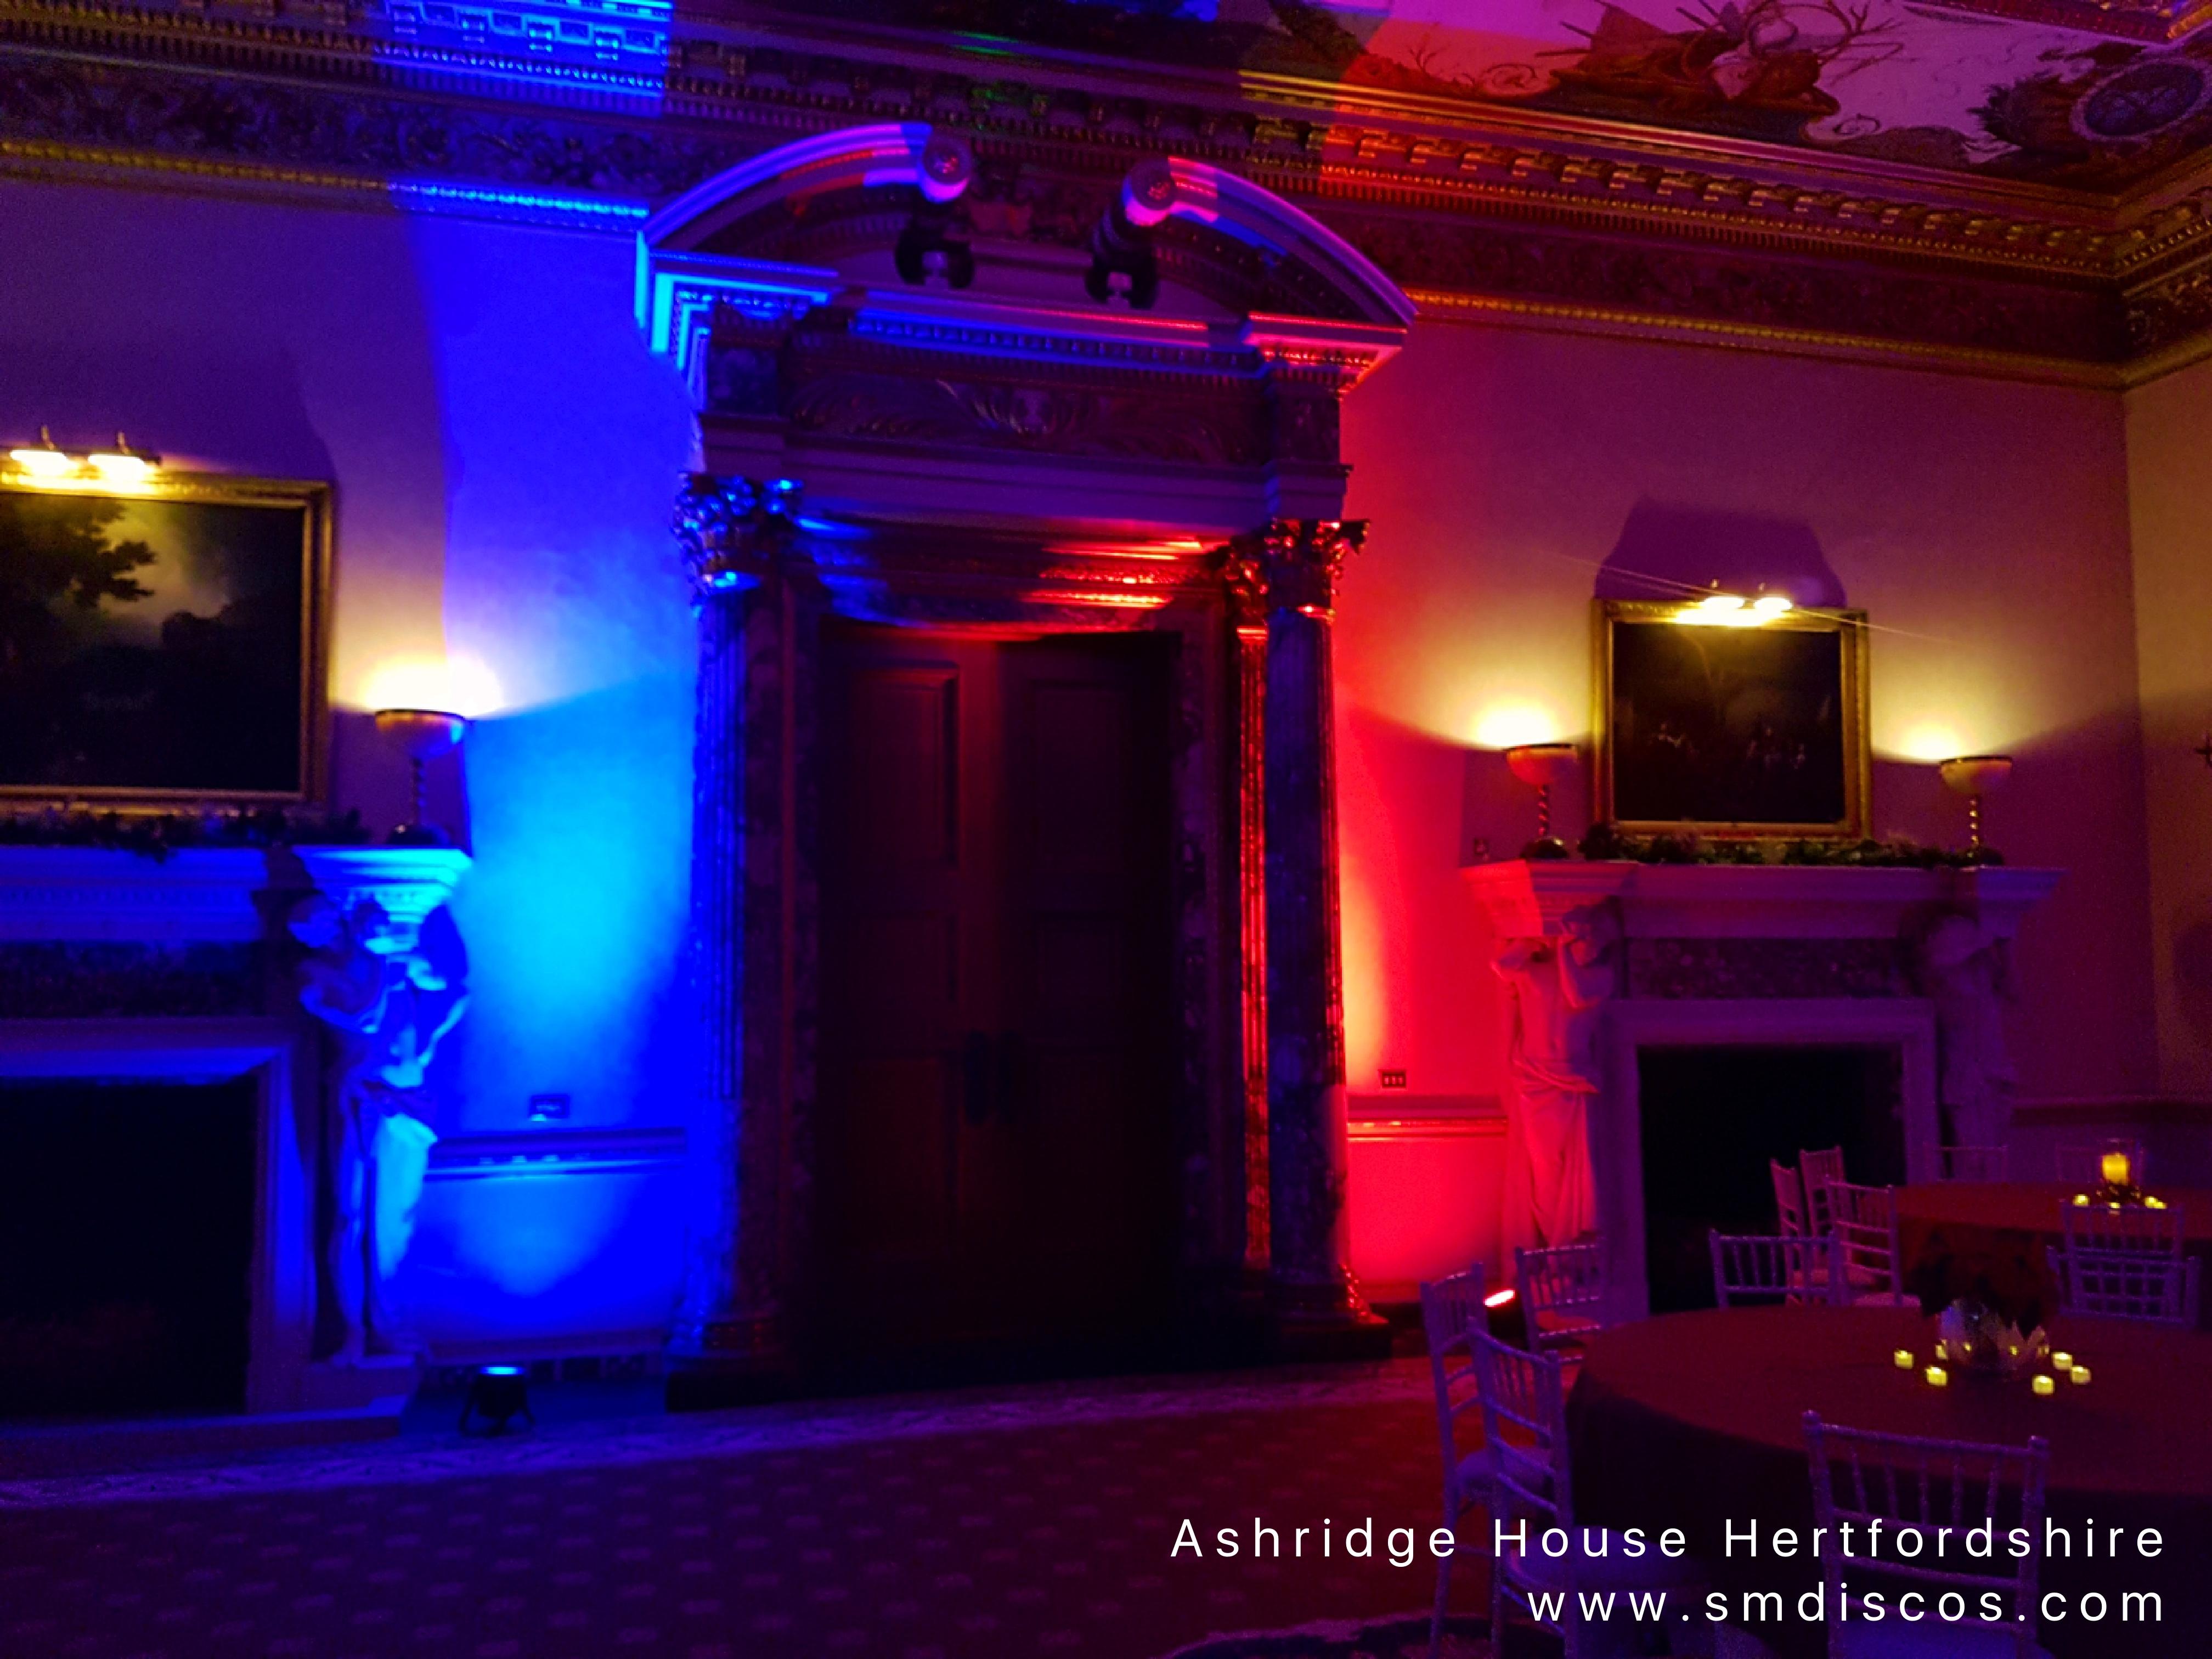 Ashridge House Hertfordshire www